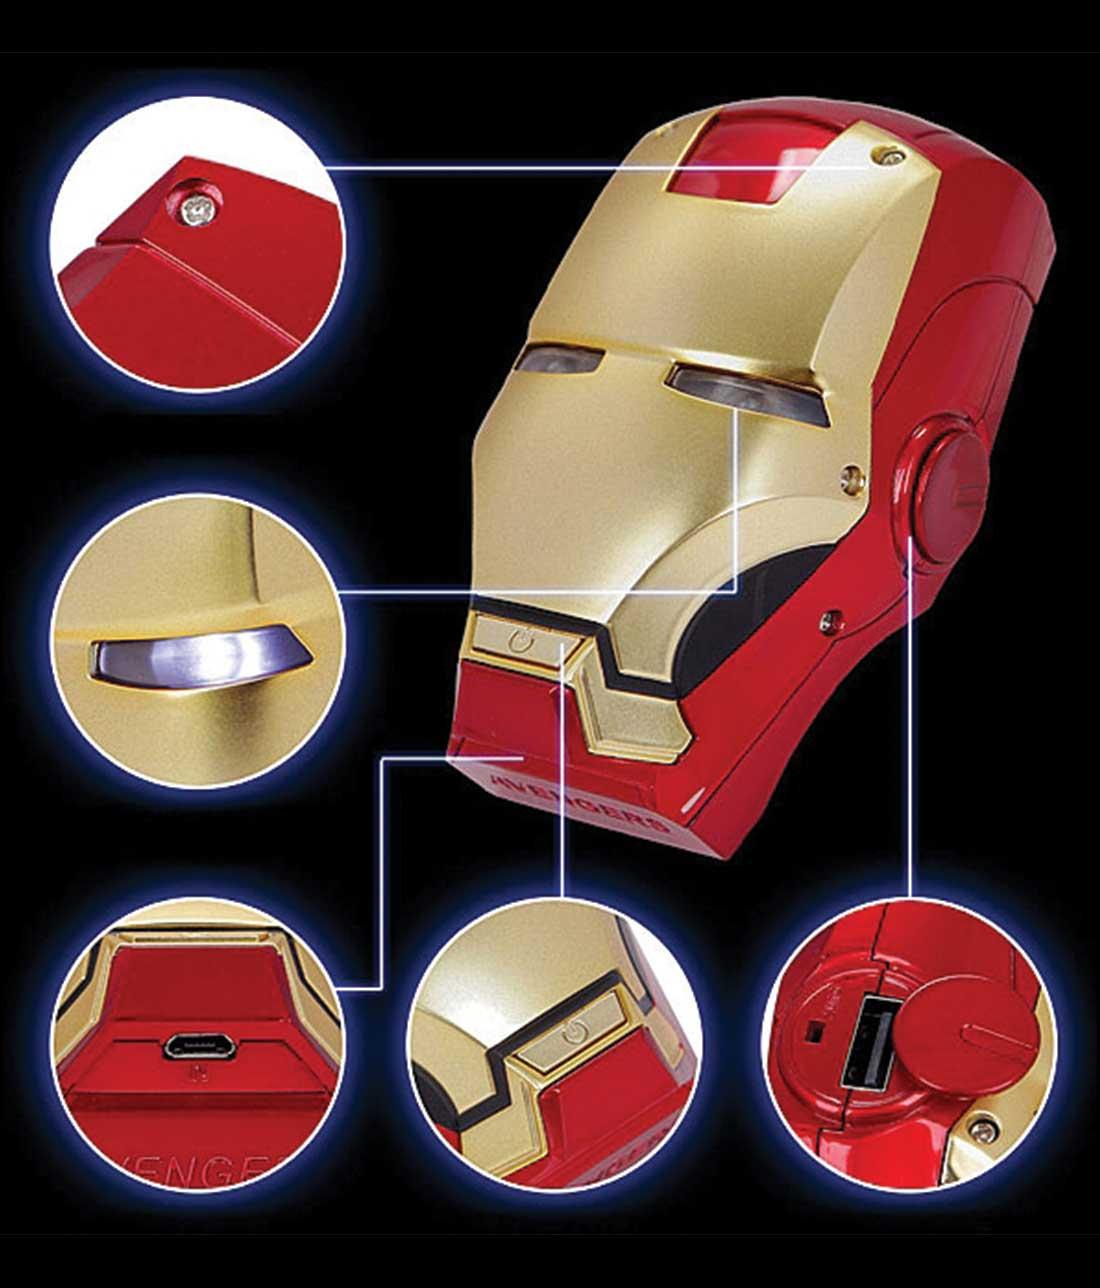 Ironman Helmet - 6000 mAh Limited Edition Powerbank